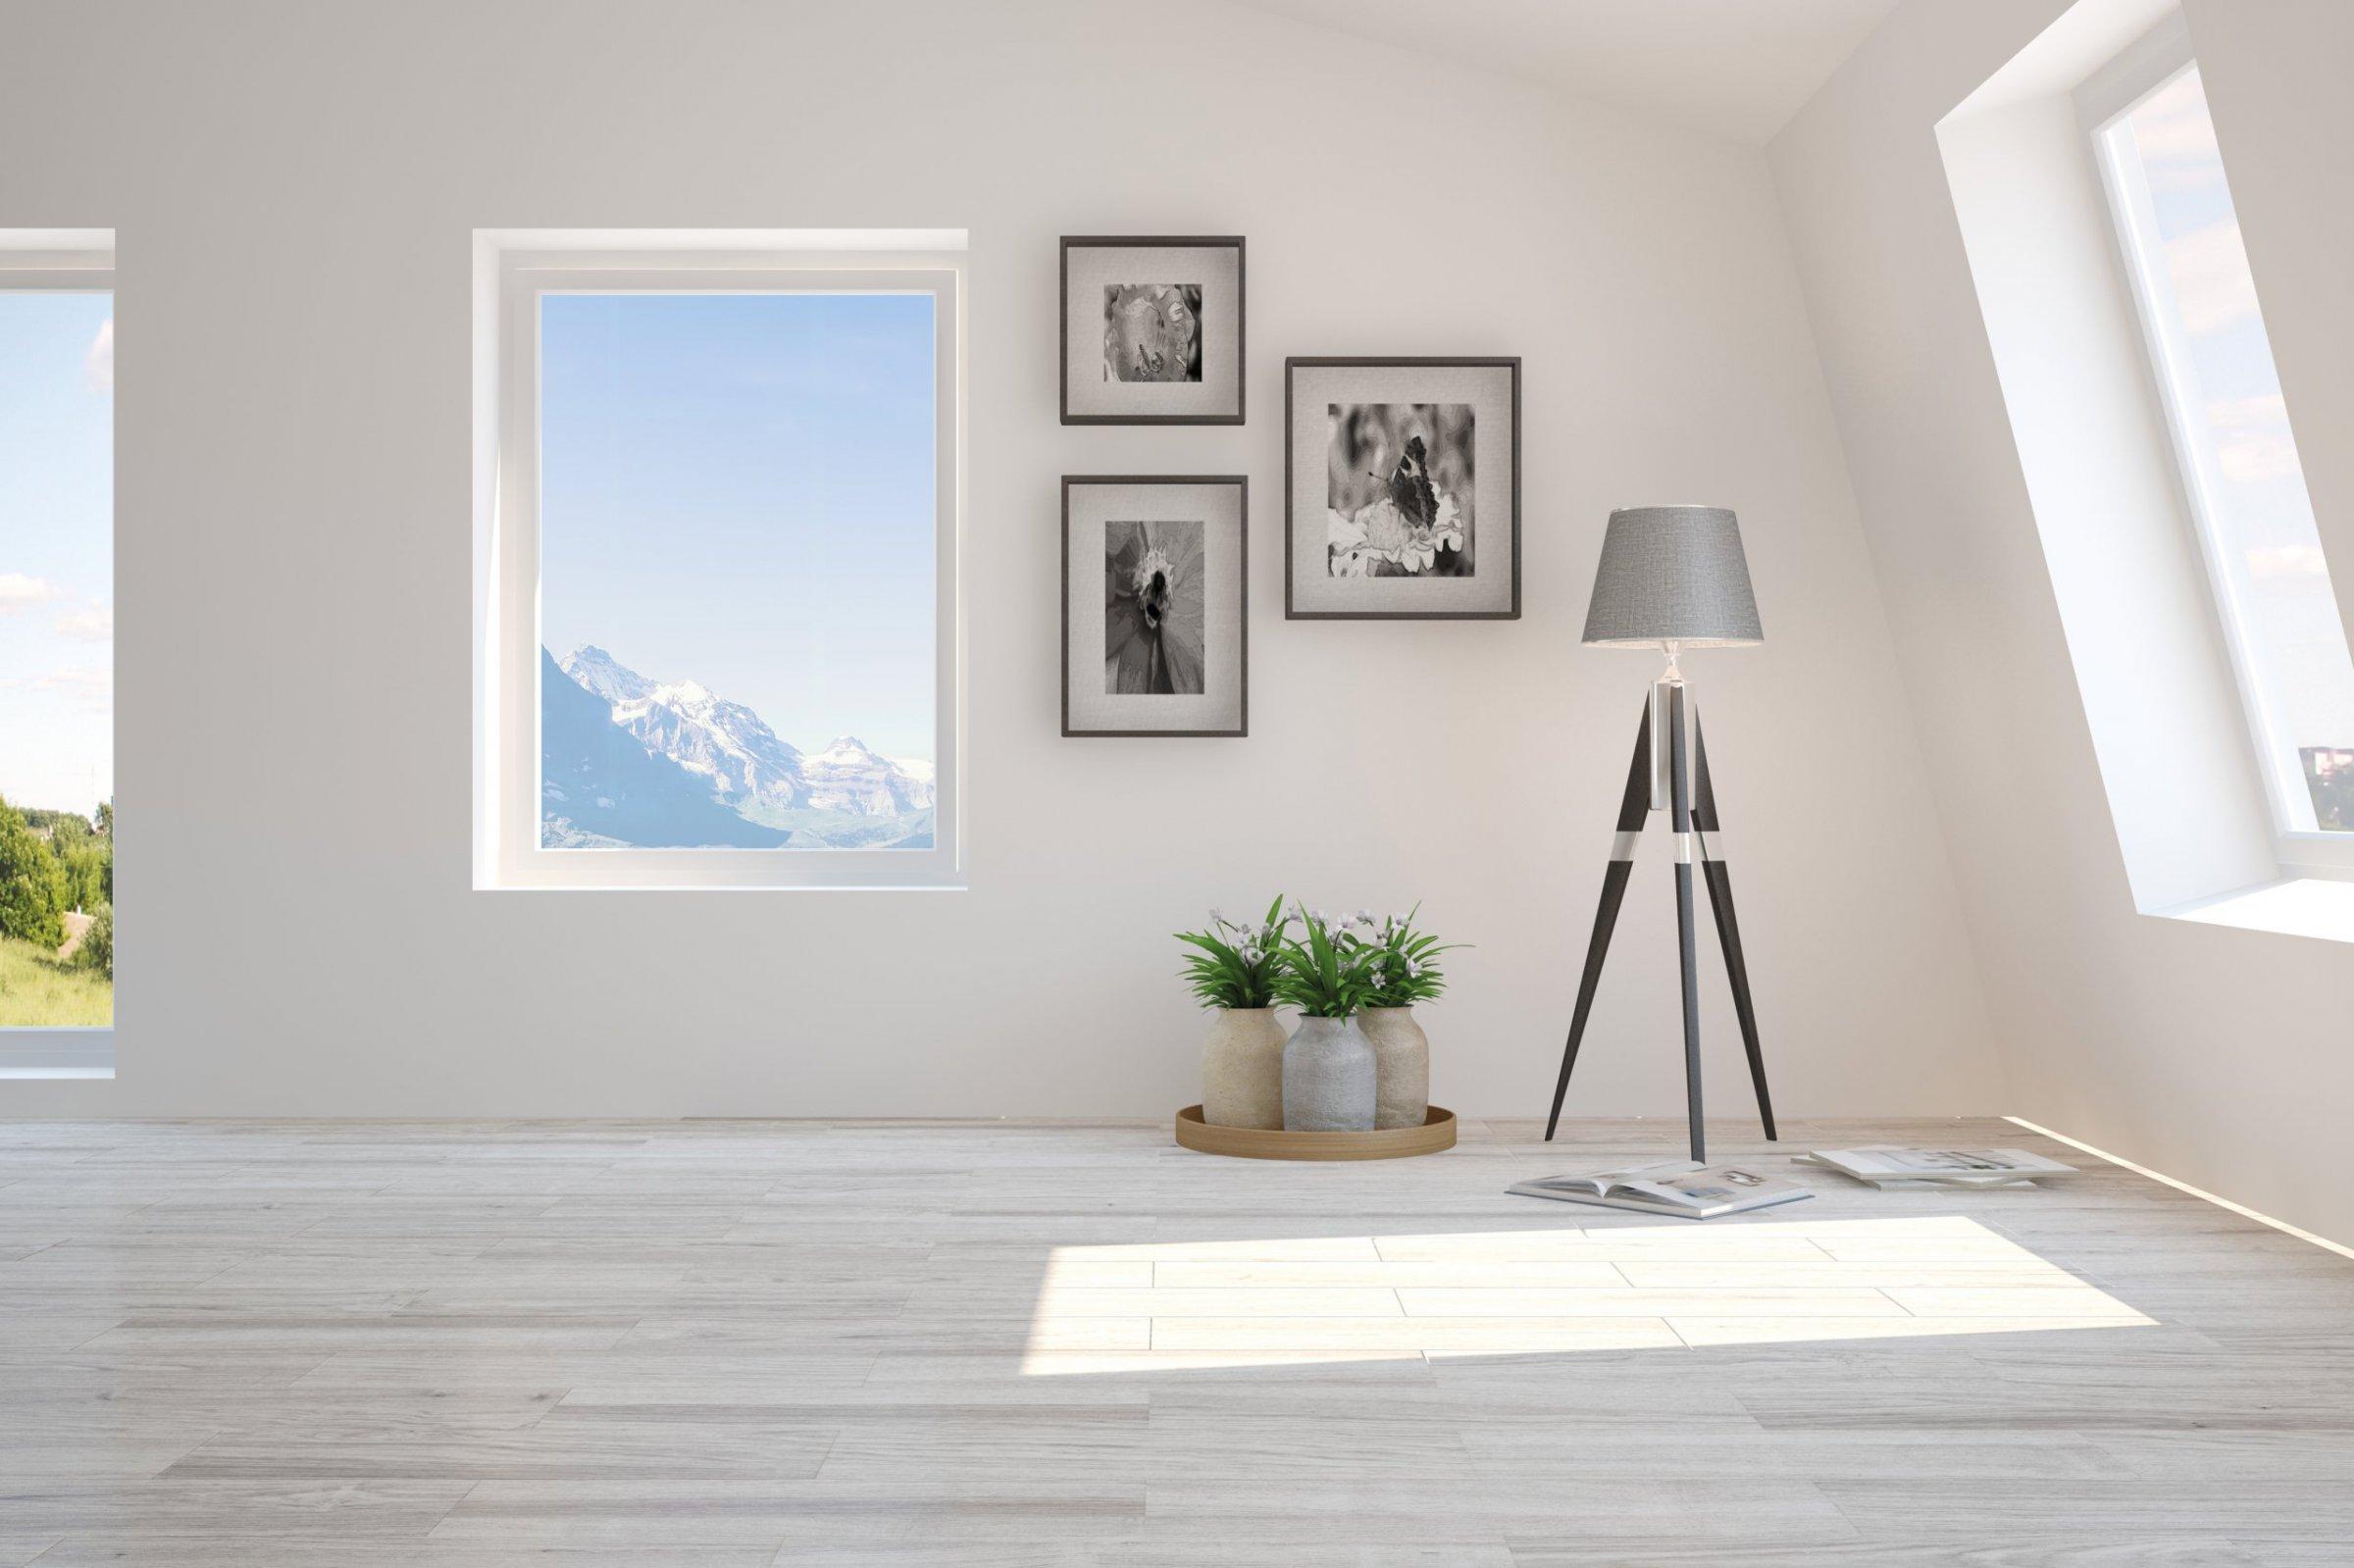 Fenster 400 - Фото 12